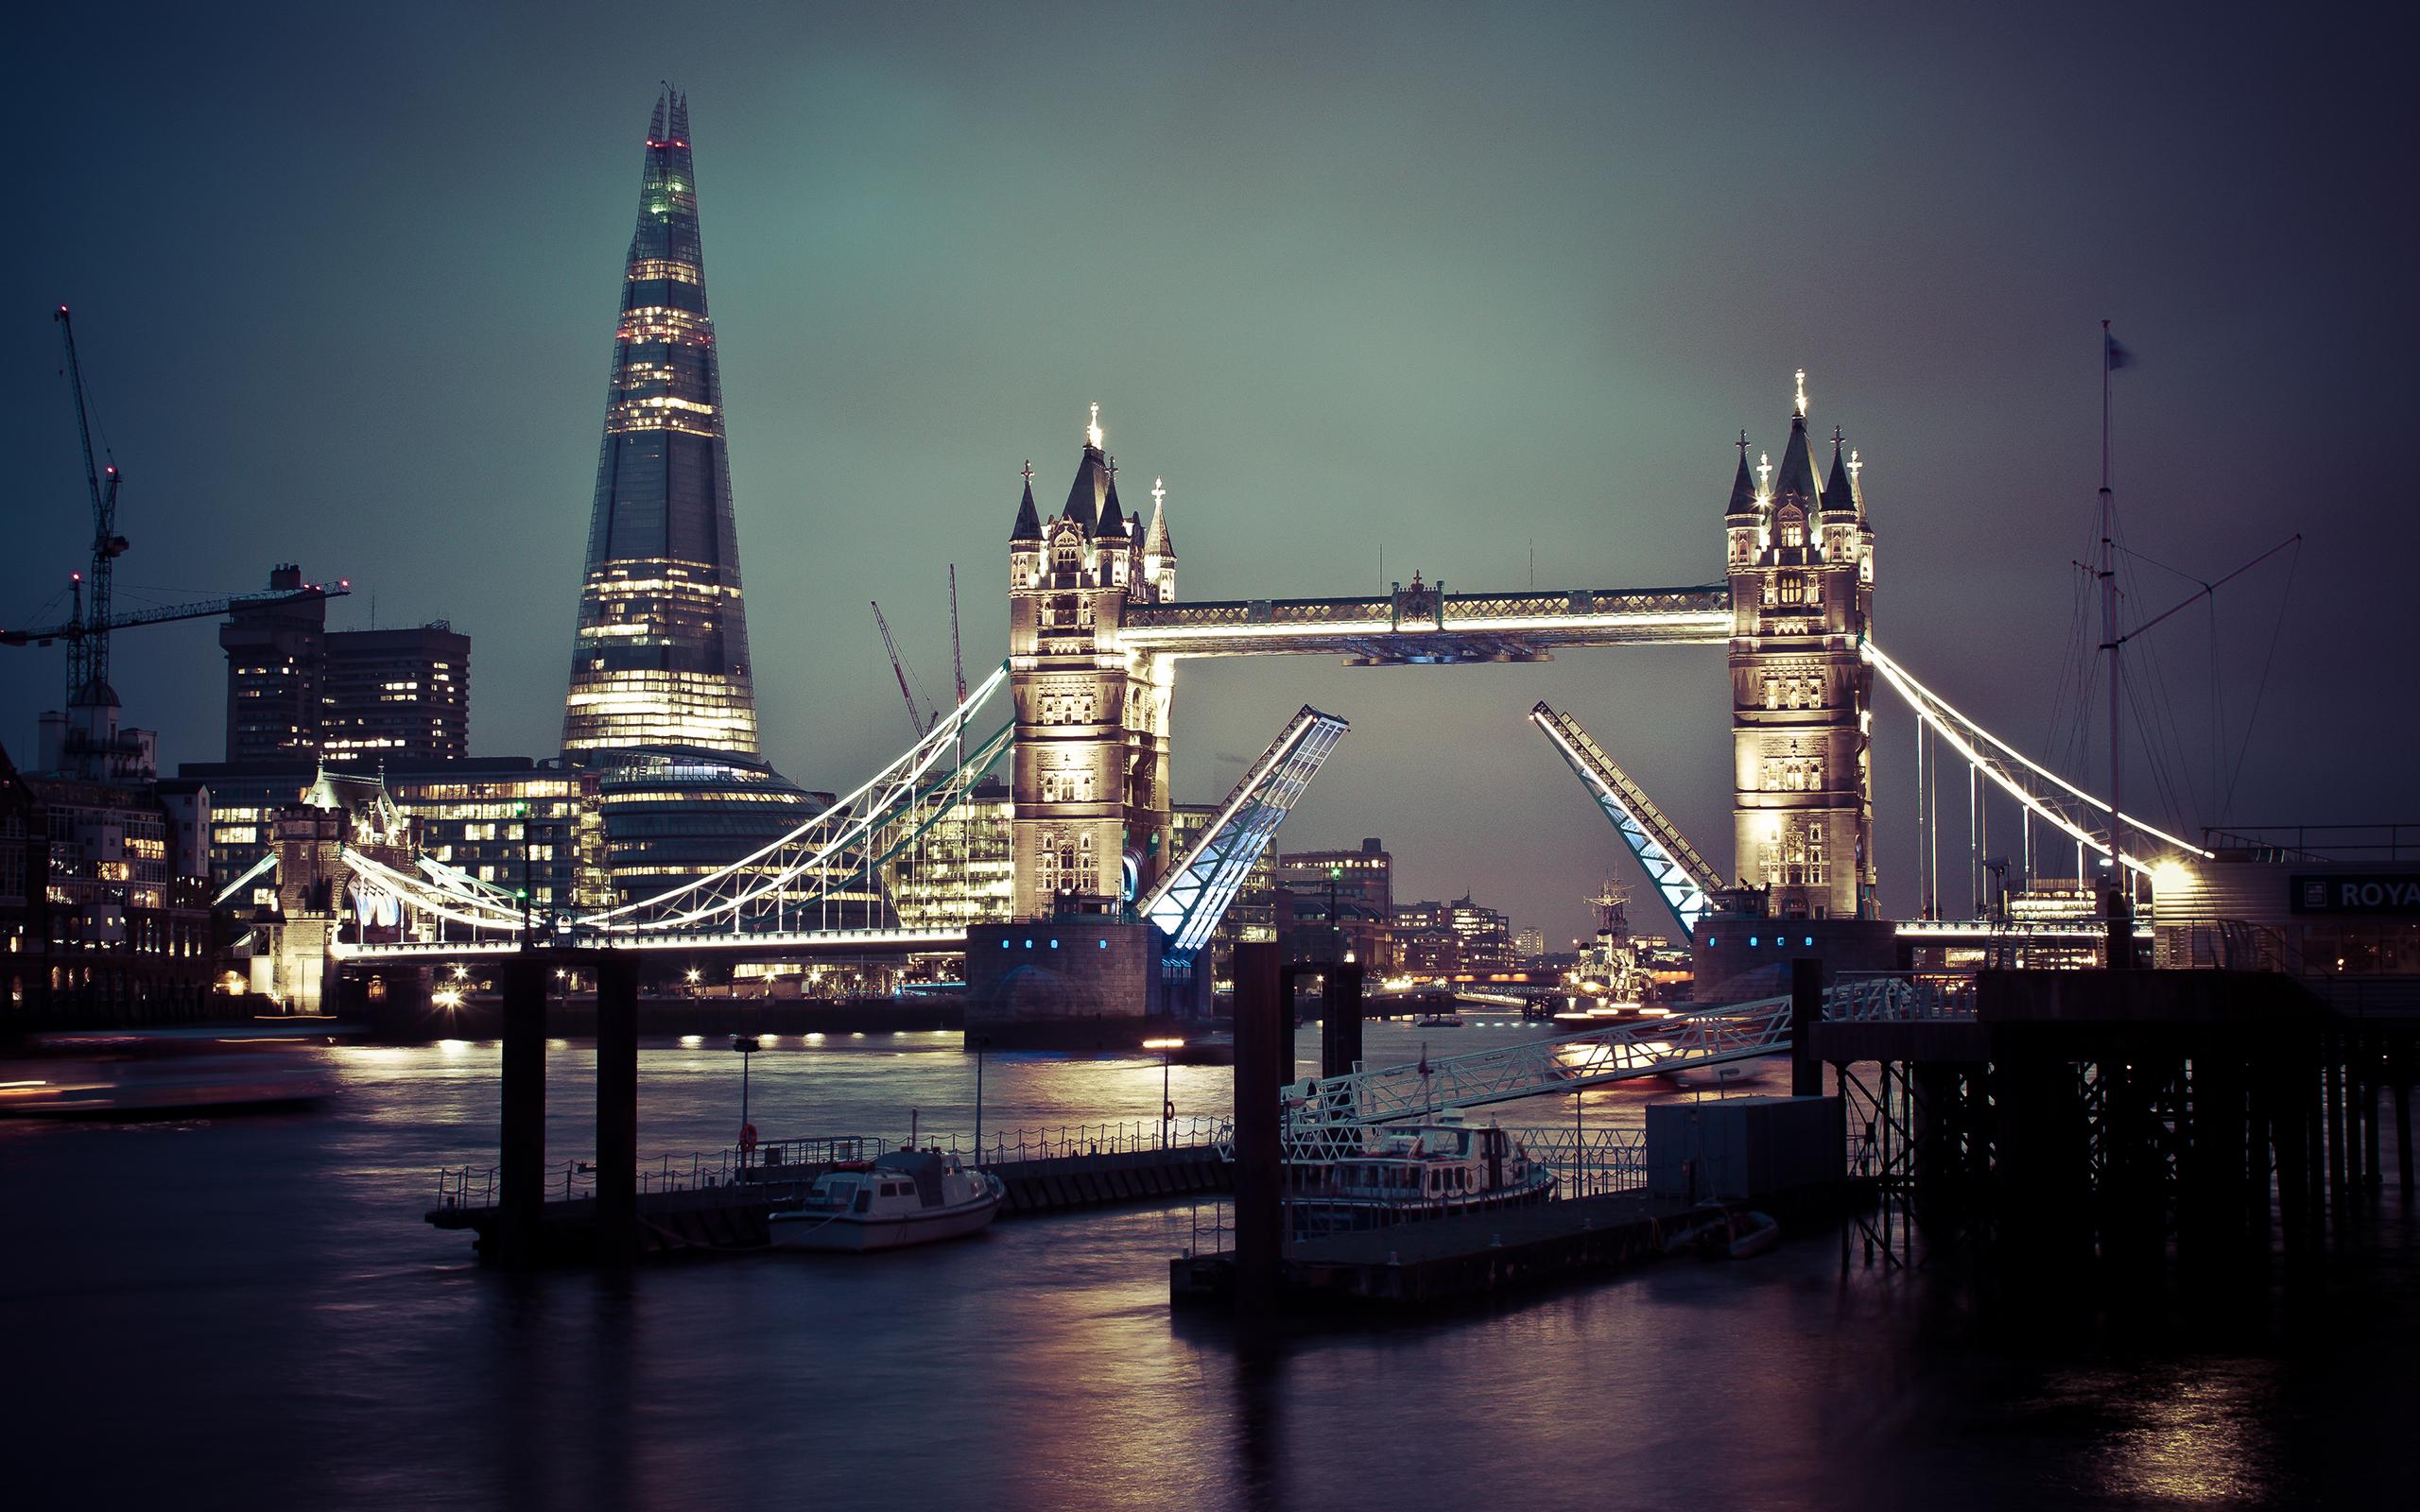 Tower Bridge of London Wallpapers HD Wallpapers 2560x1600